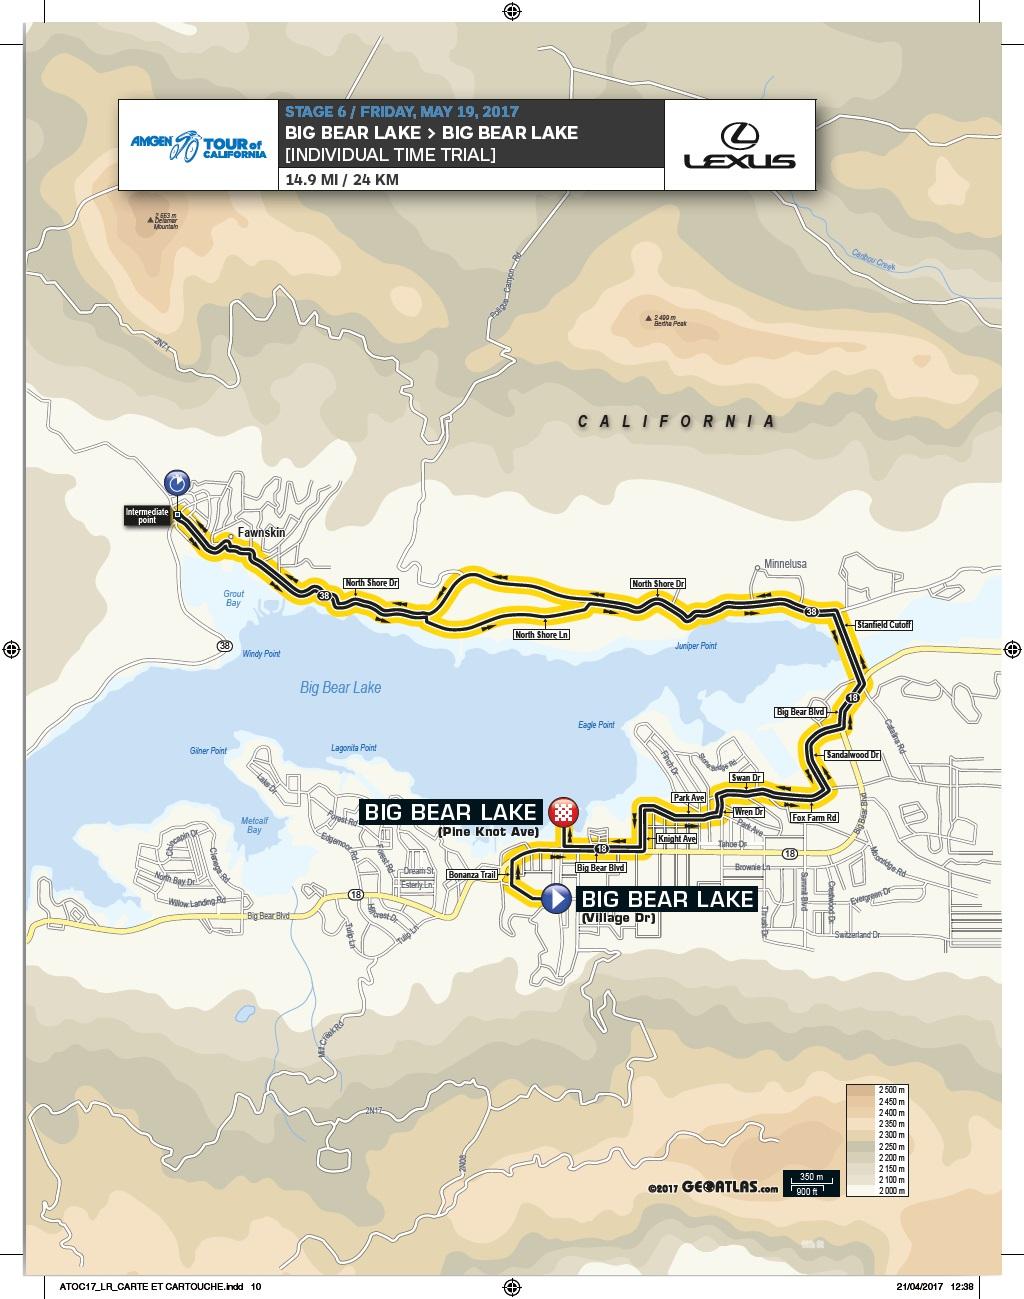 Streckenverlauf Amgen Tour of California 2017 - Etappe 6